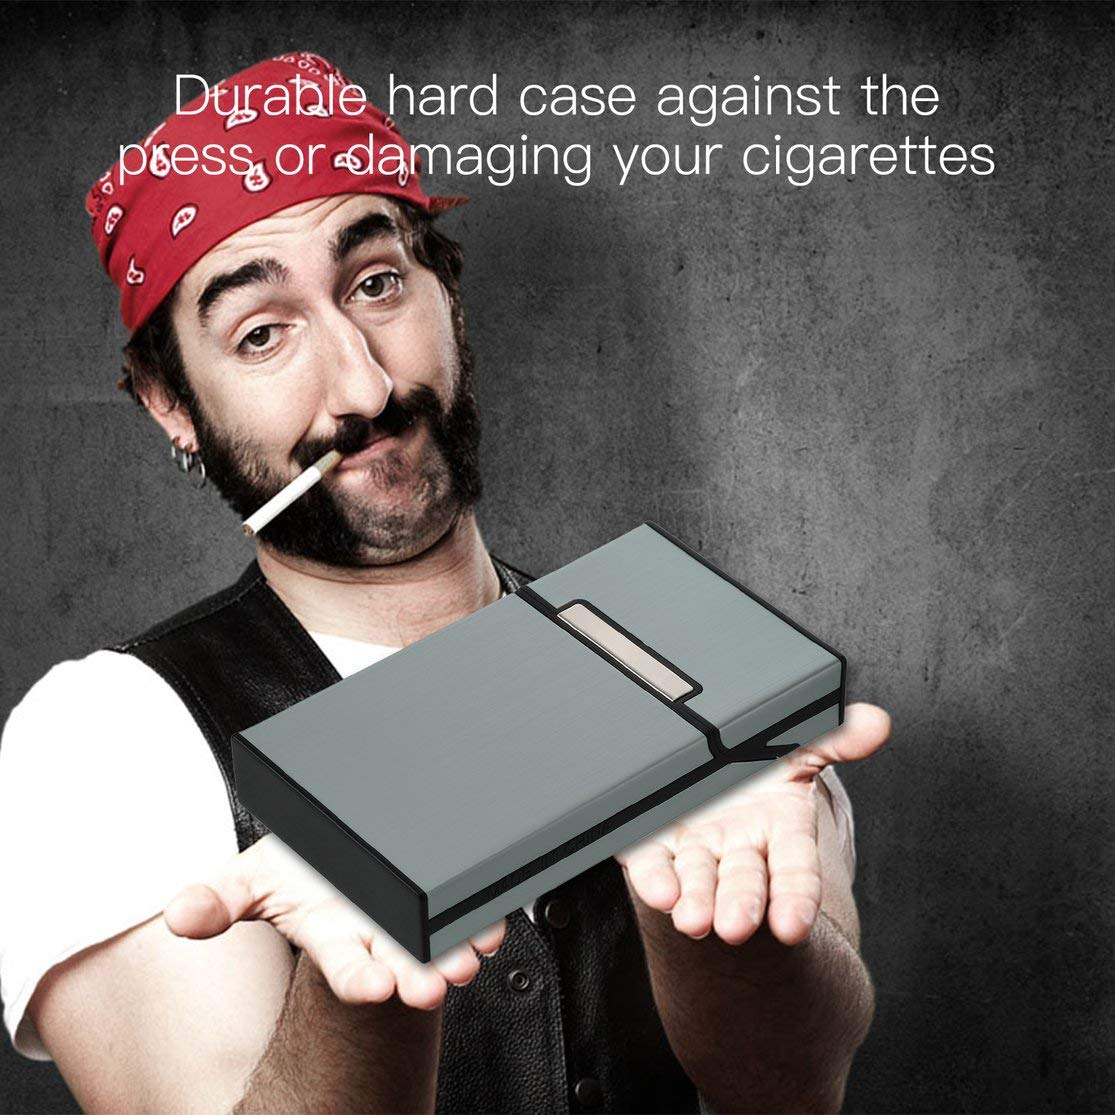 LouiseEvel215 Ligero de Aleaci/ón de Alambre Dibujo Cigarro Estuche de Cigarrillos Titular de Tabaco Mini Caja Contenedor de Almacenamiento Accesorios para Fumar